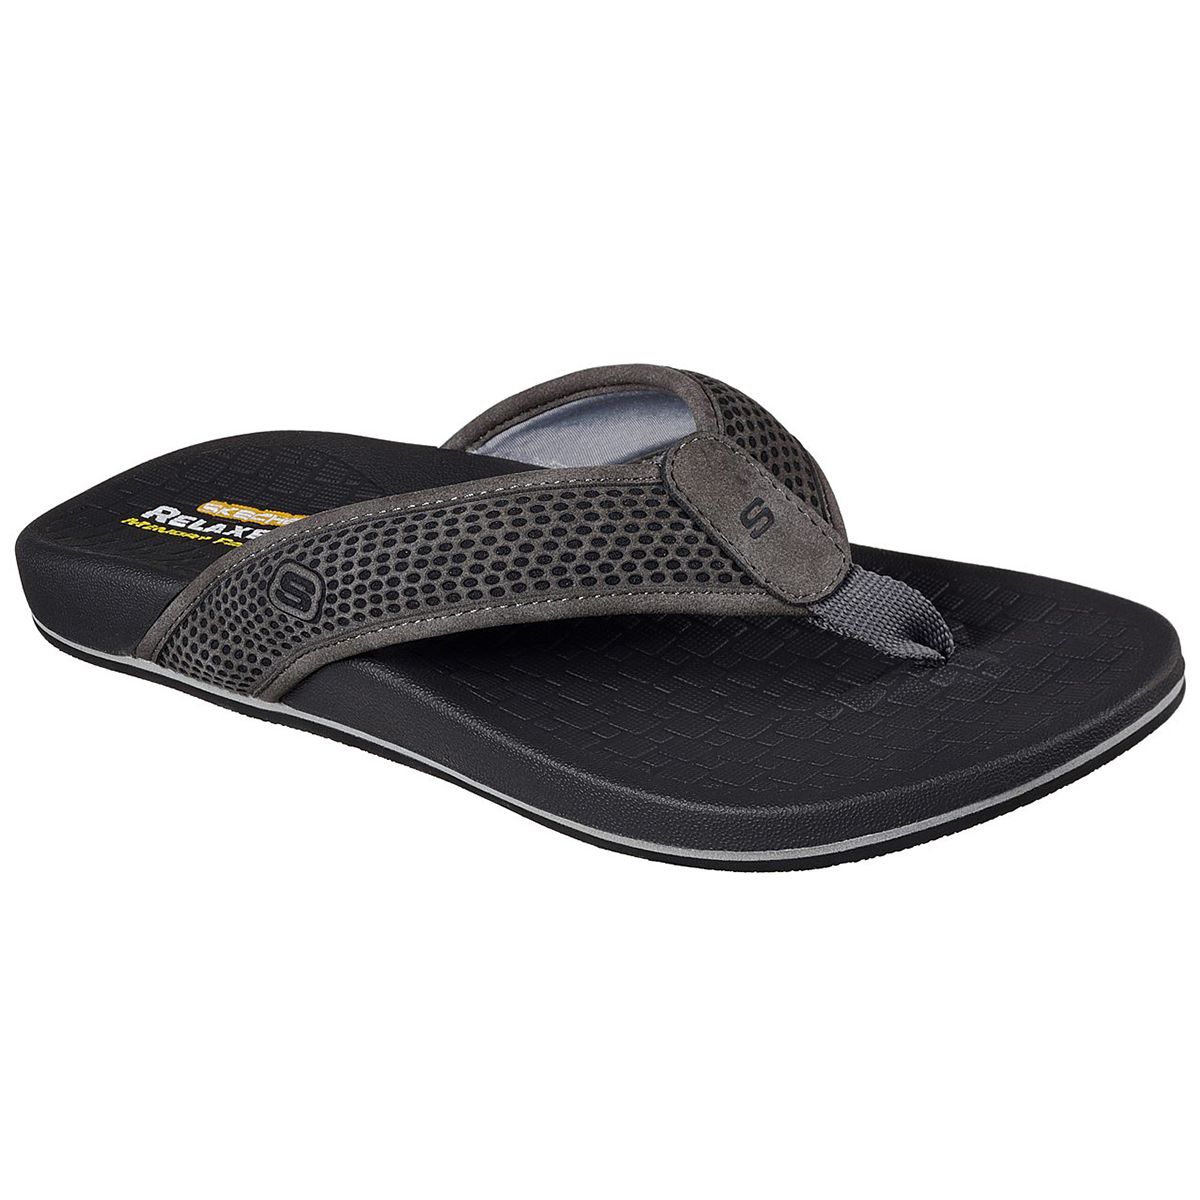 Skechers Men's Relaxed Fit: Pelem- Emiro Sandals - Black, 9